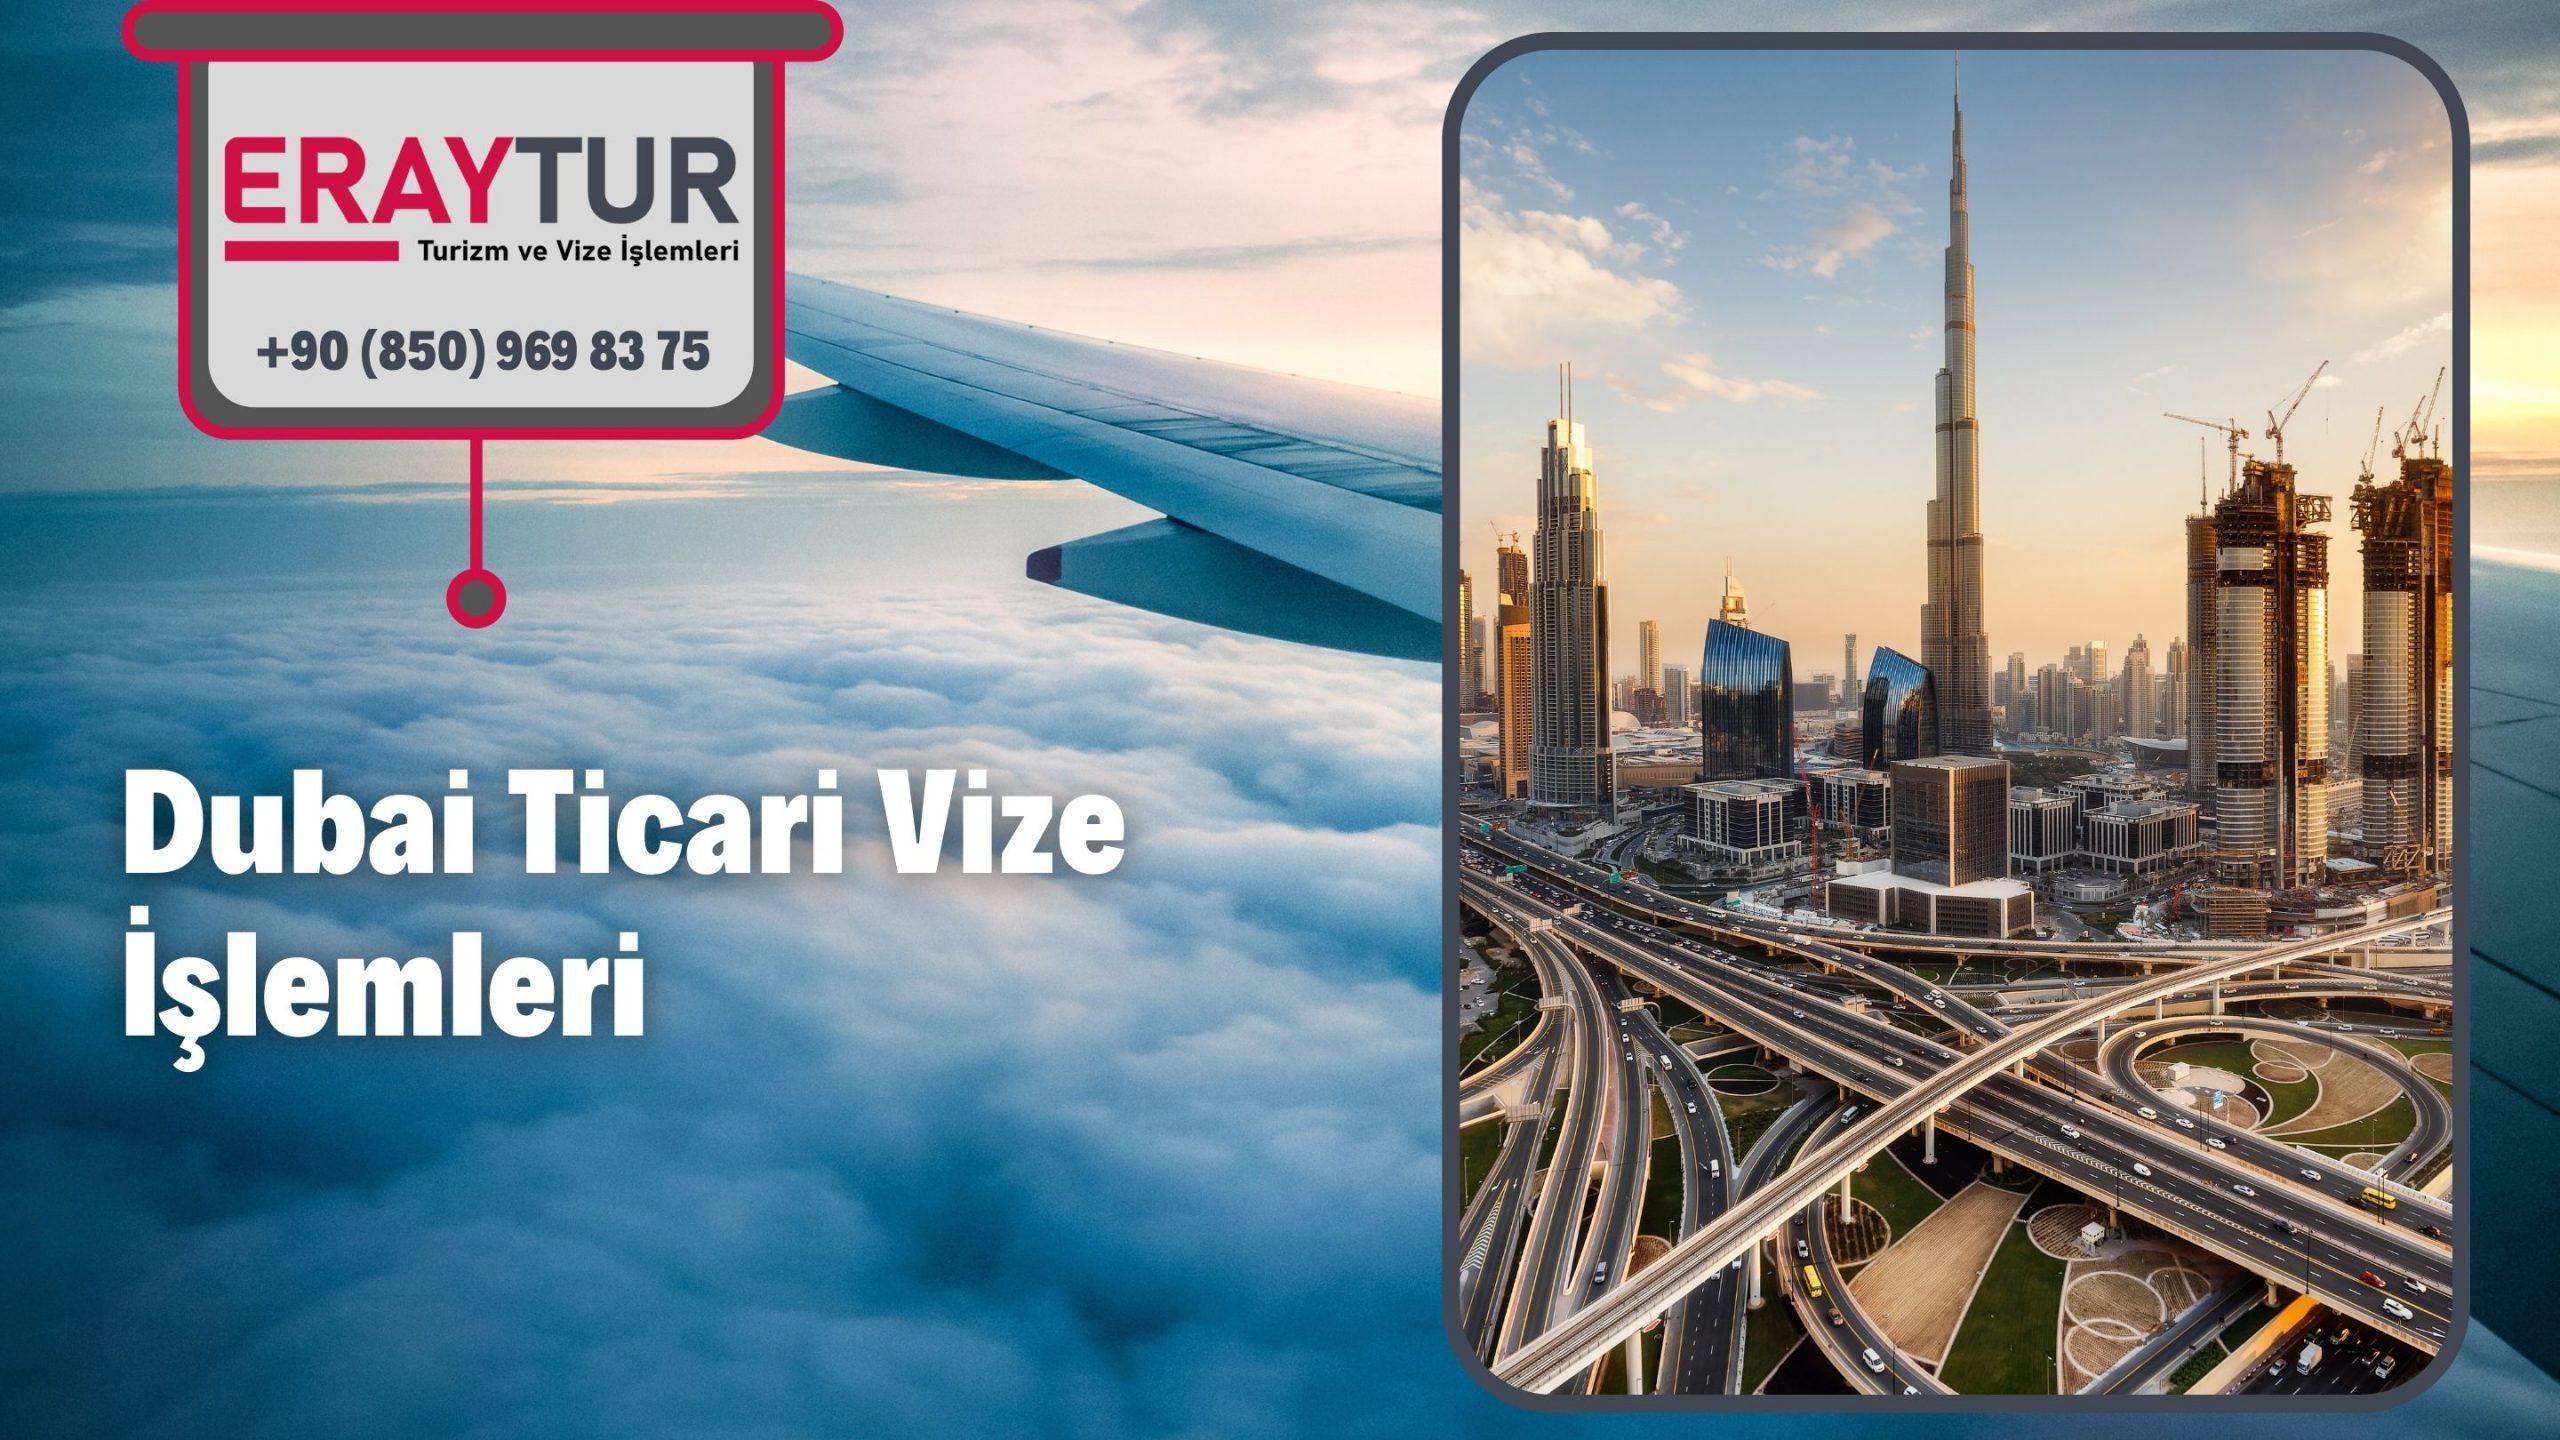 Dubai Ticari Vize İşlemleri